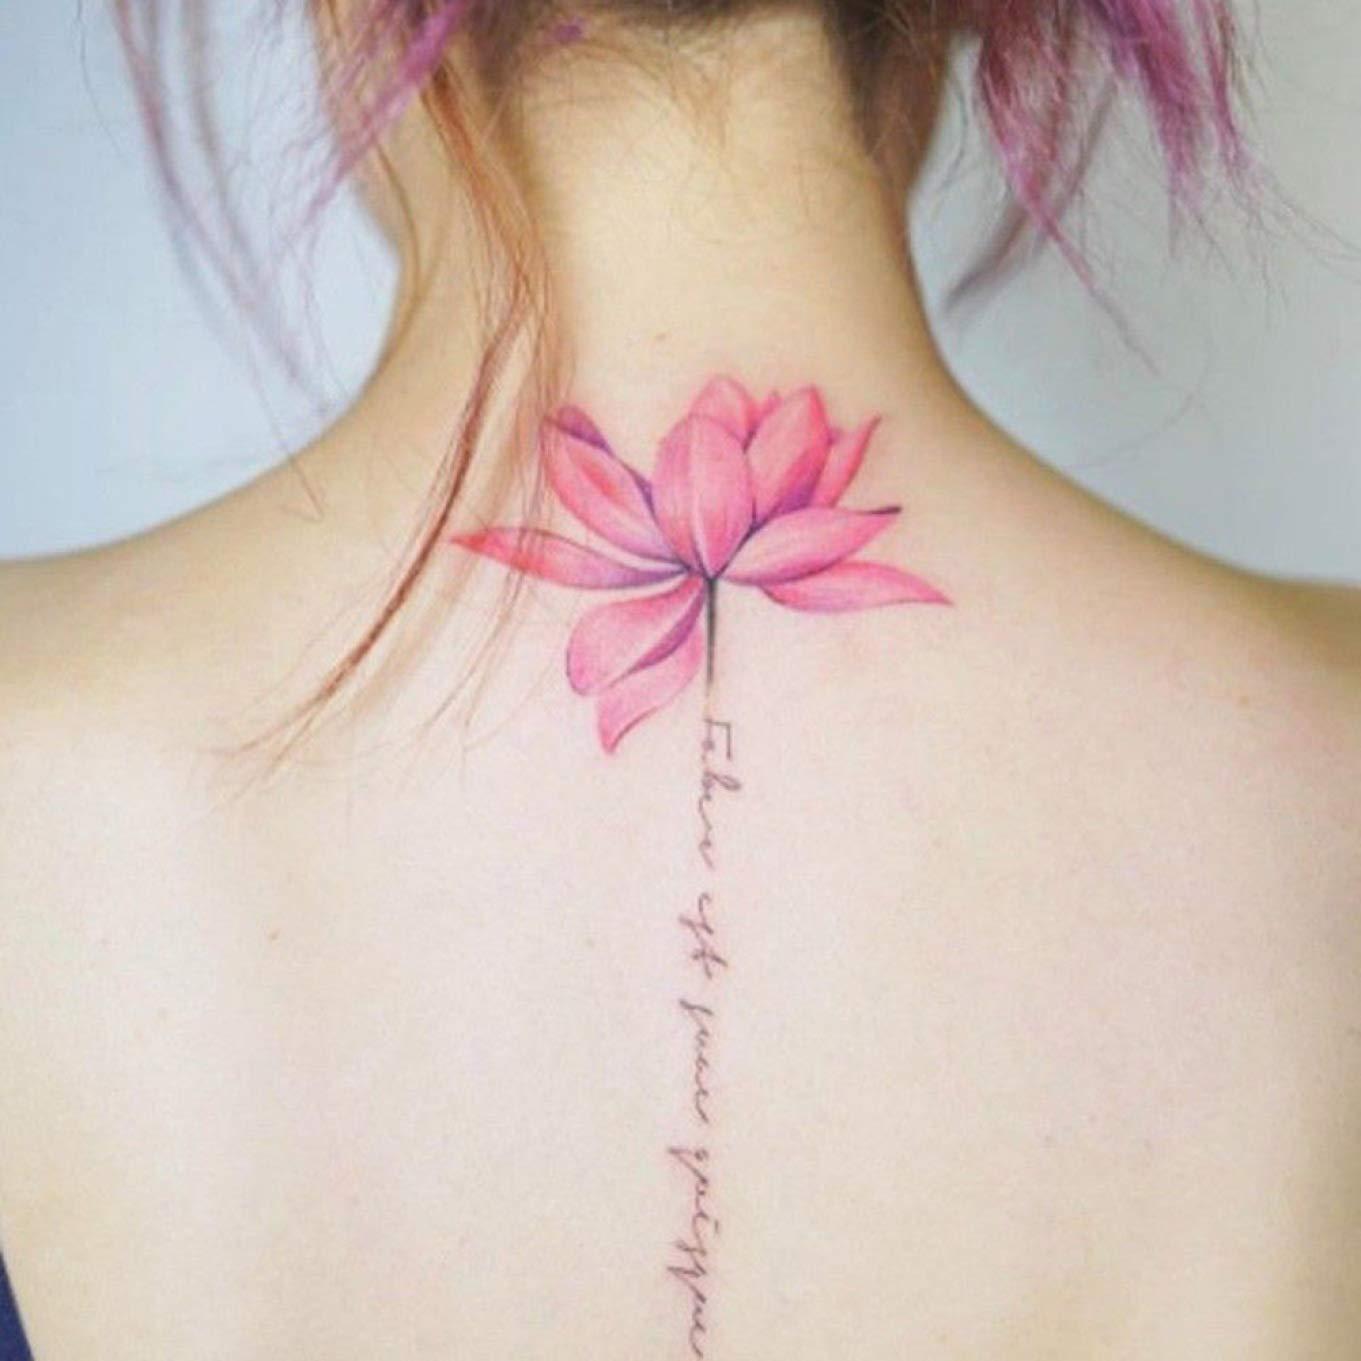 Wondergirls Extraordinary 1pc Lotus Flower Temporary Tattoos Stickers Body Art 3d Lotus Tatoo Waterproof None H03 Amazon In Beauty